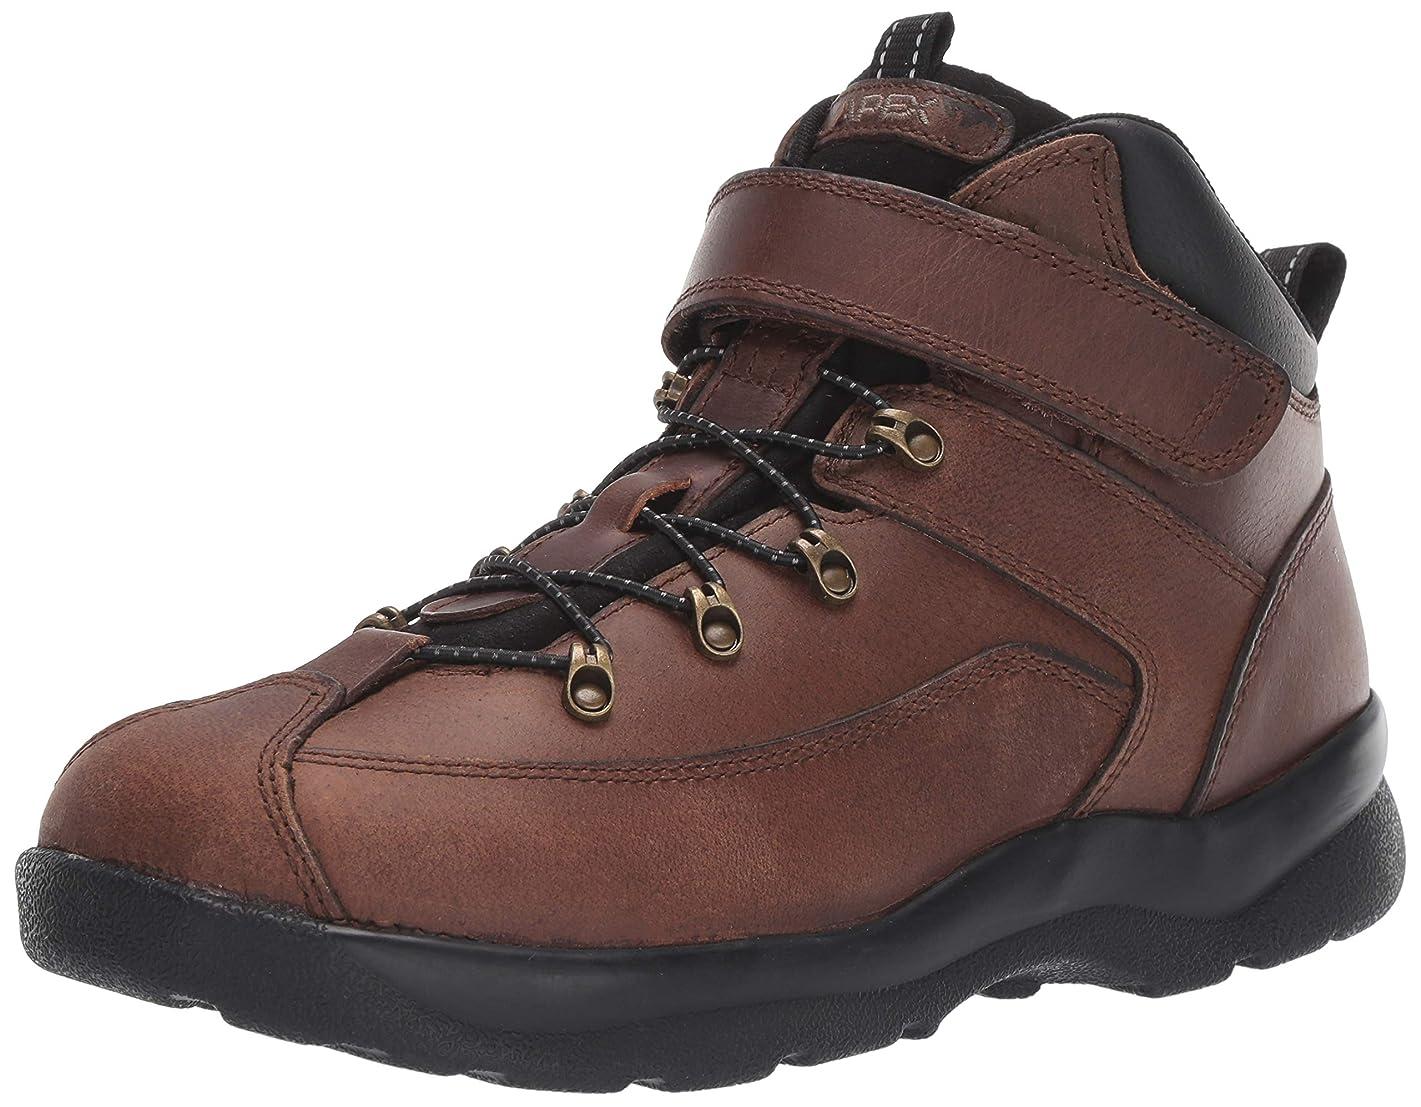 Apex Men's Ariya Hiking Boot, Brown, 9